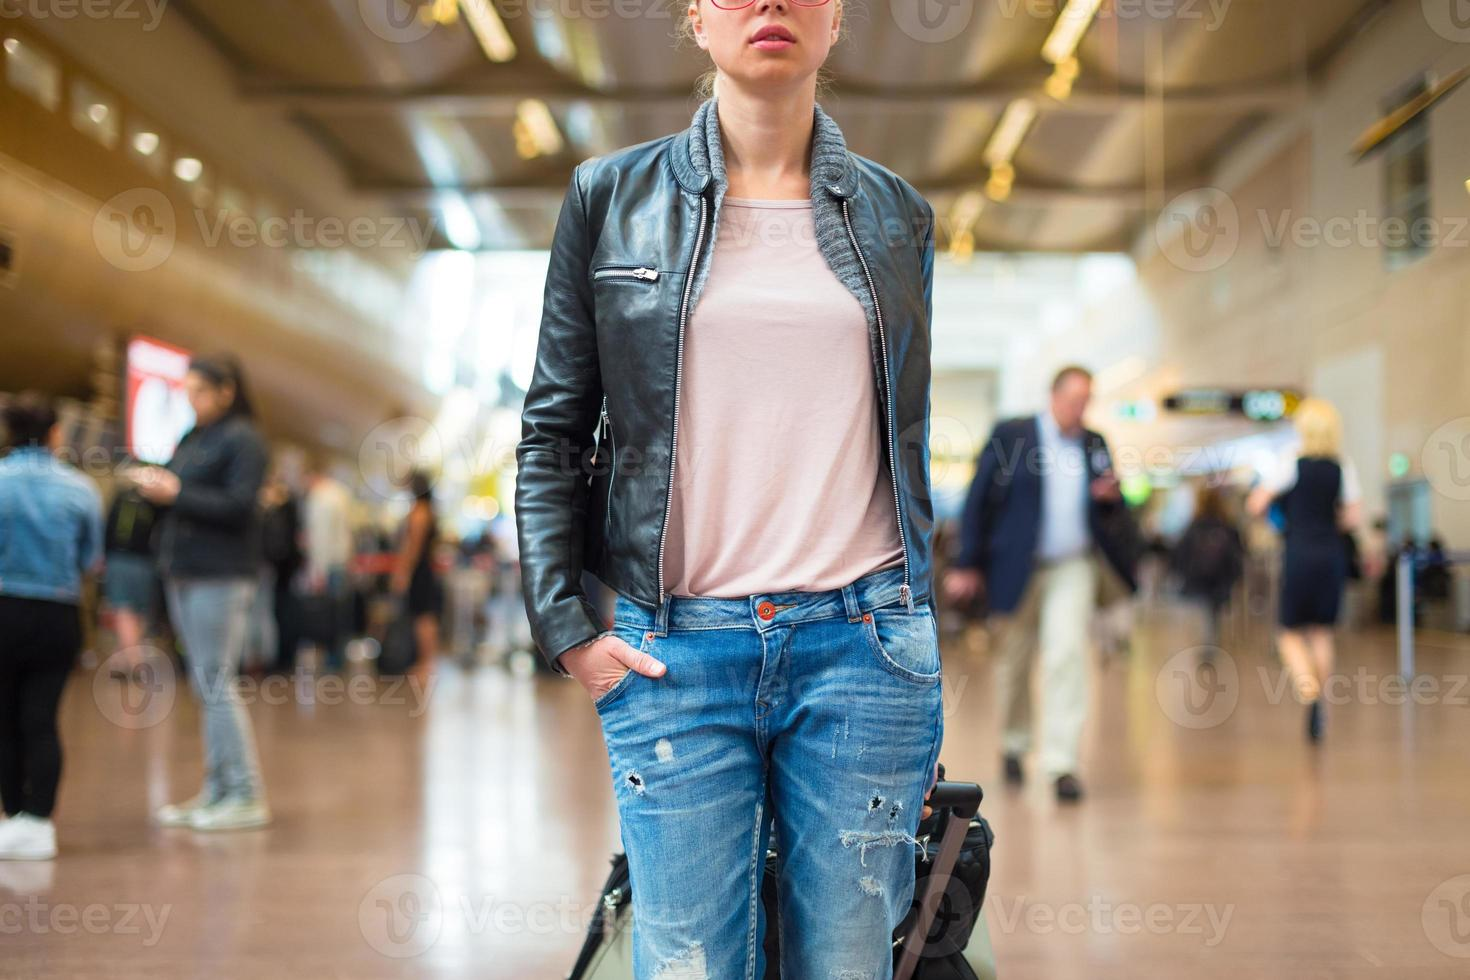 vrouwelijke reiziger lopen luchthaventerminal. foto